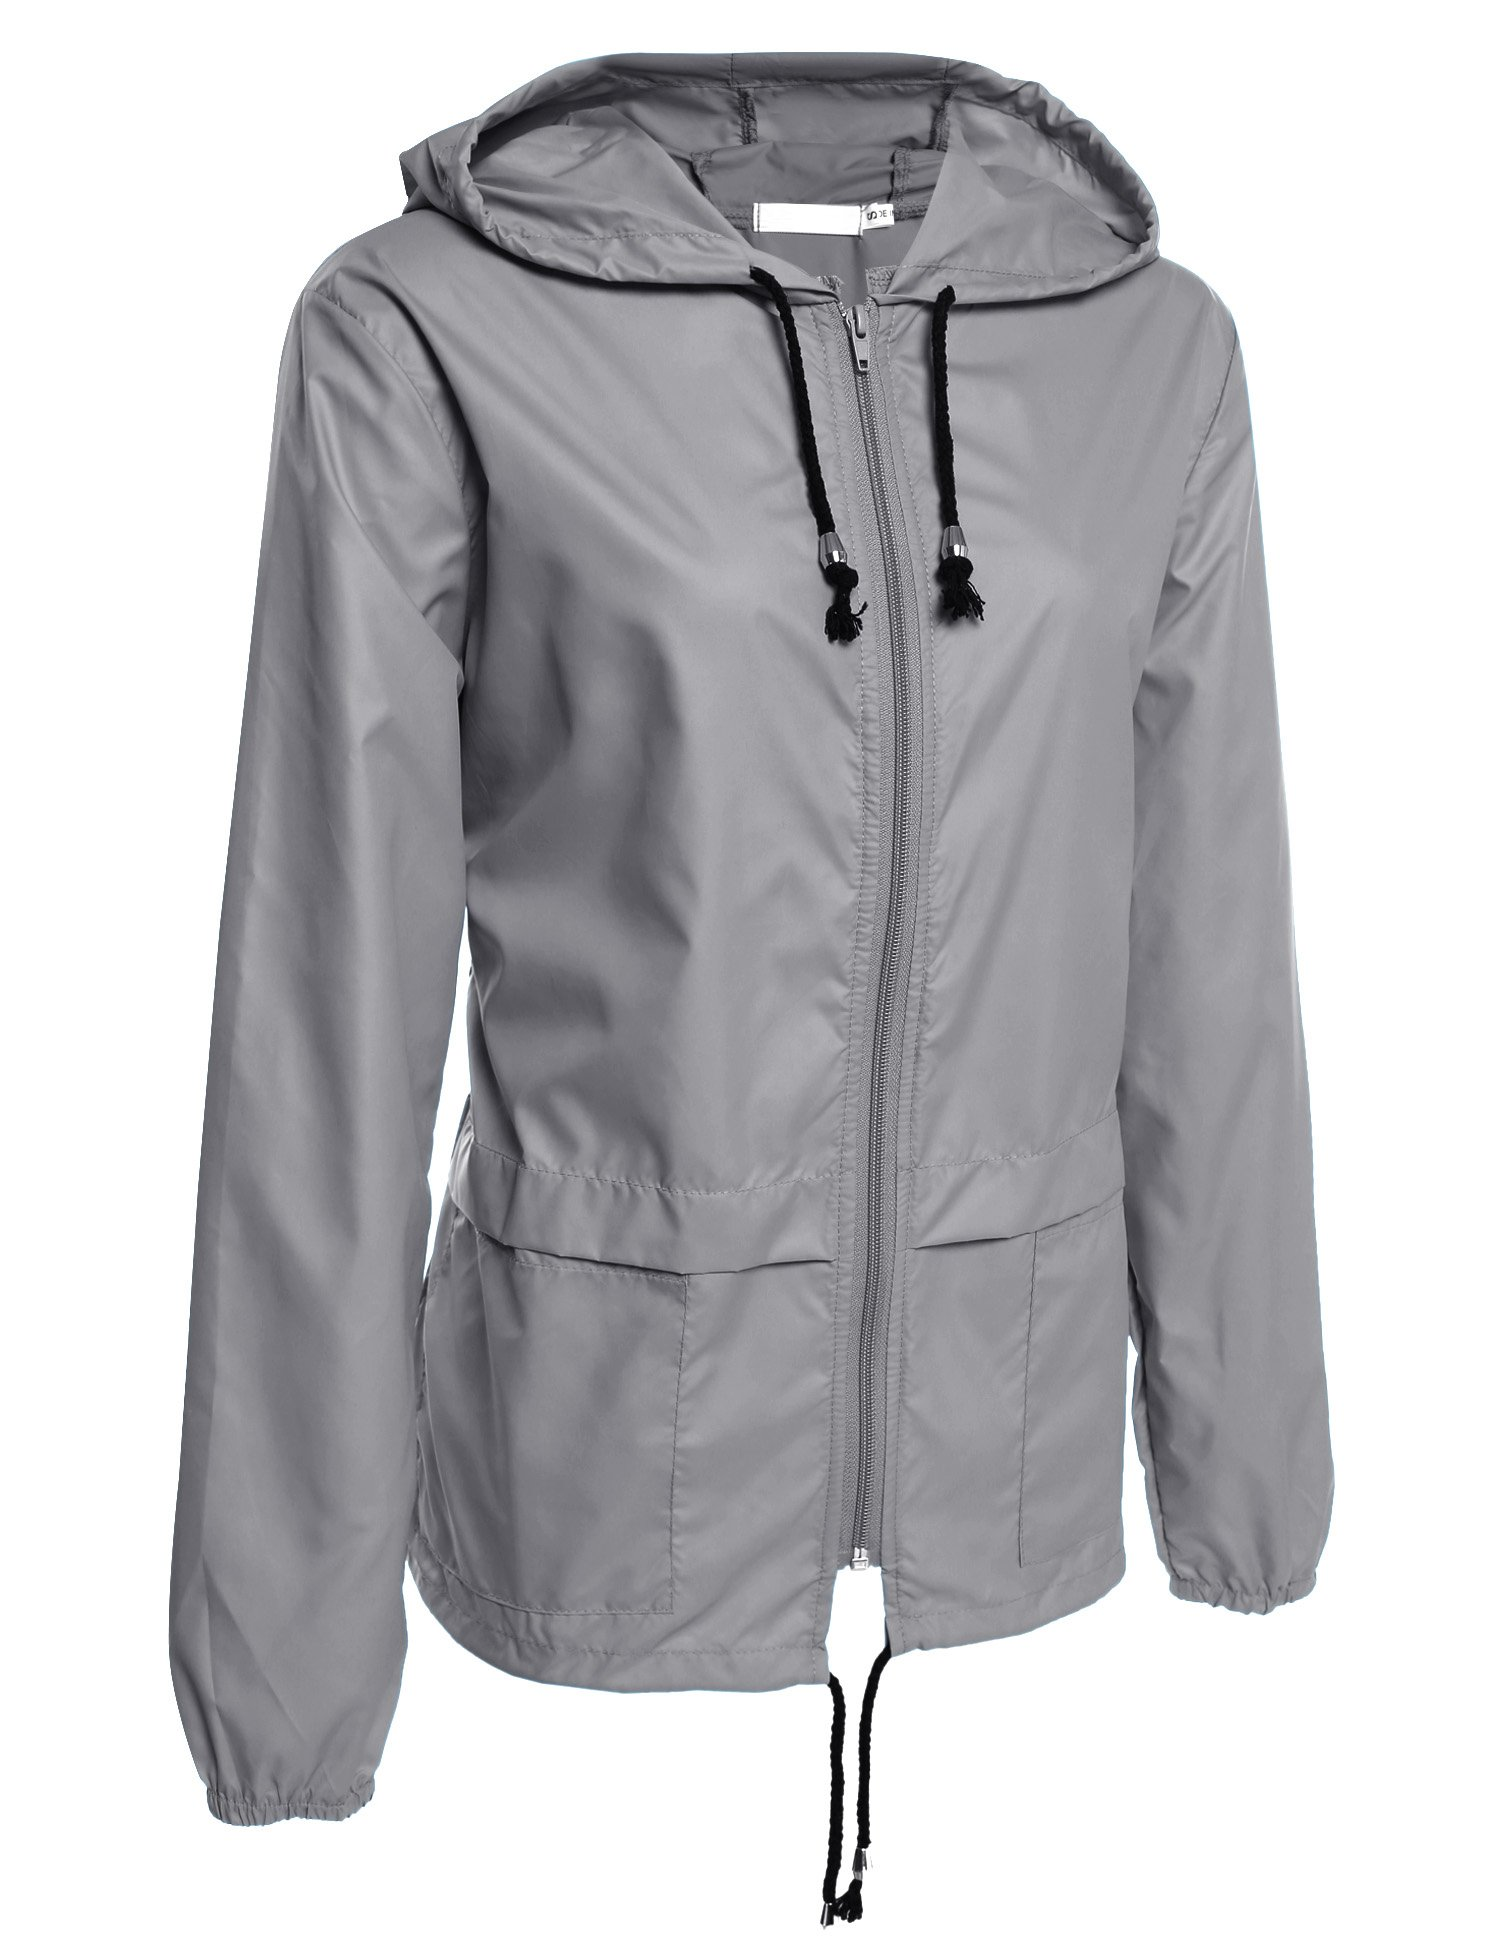 Beyove Women's Lightweight Rain Jacket Active Outdoor Waterproof Packable Hooded Raincoat by Beyove (Image #2)